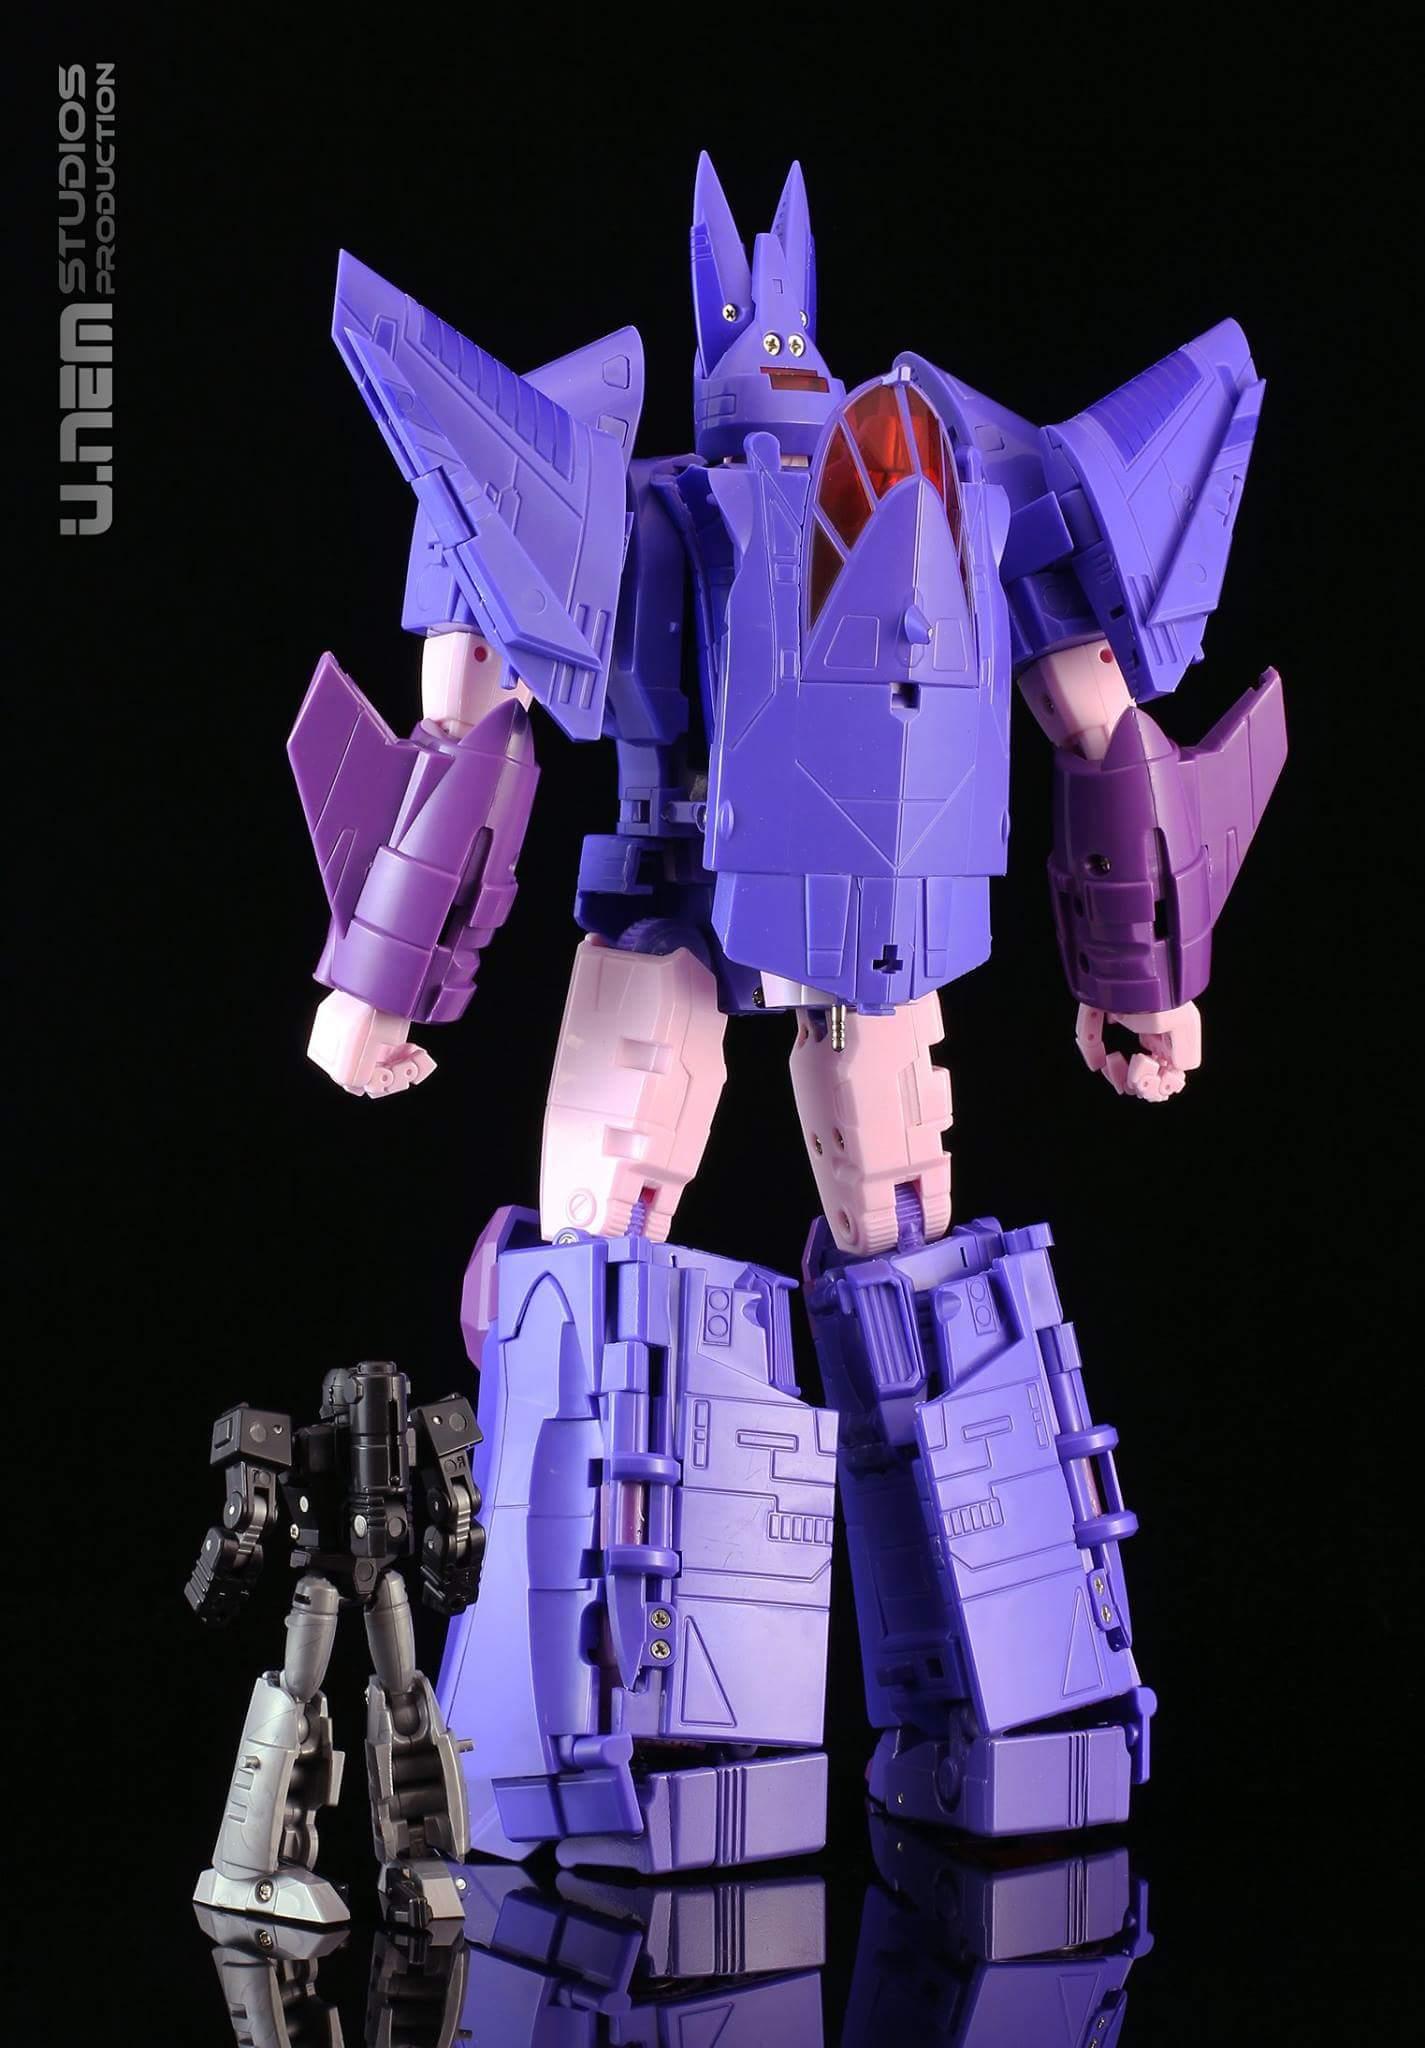 [X-Transbots] Produit Tiers - MX-III Eligos - aka Cyclonus - Page 3 6uQFSmRu